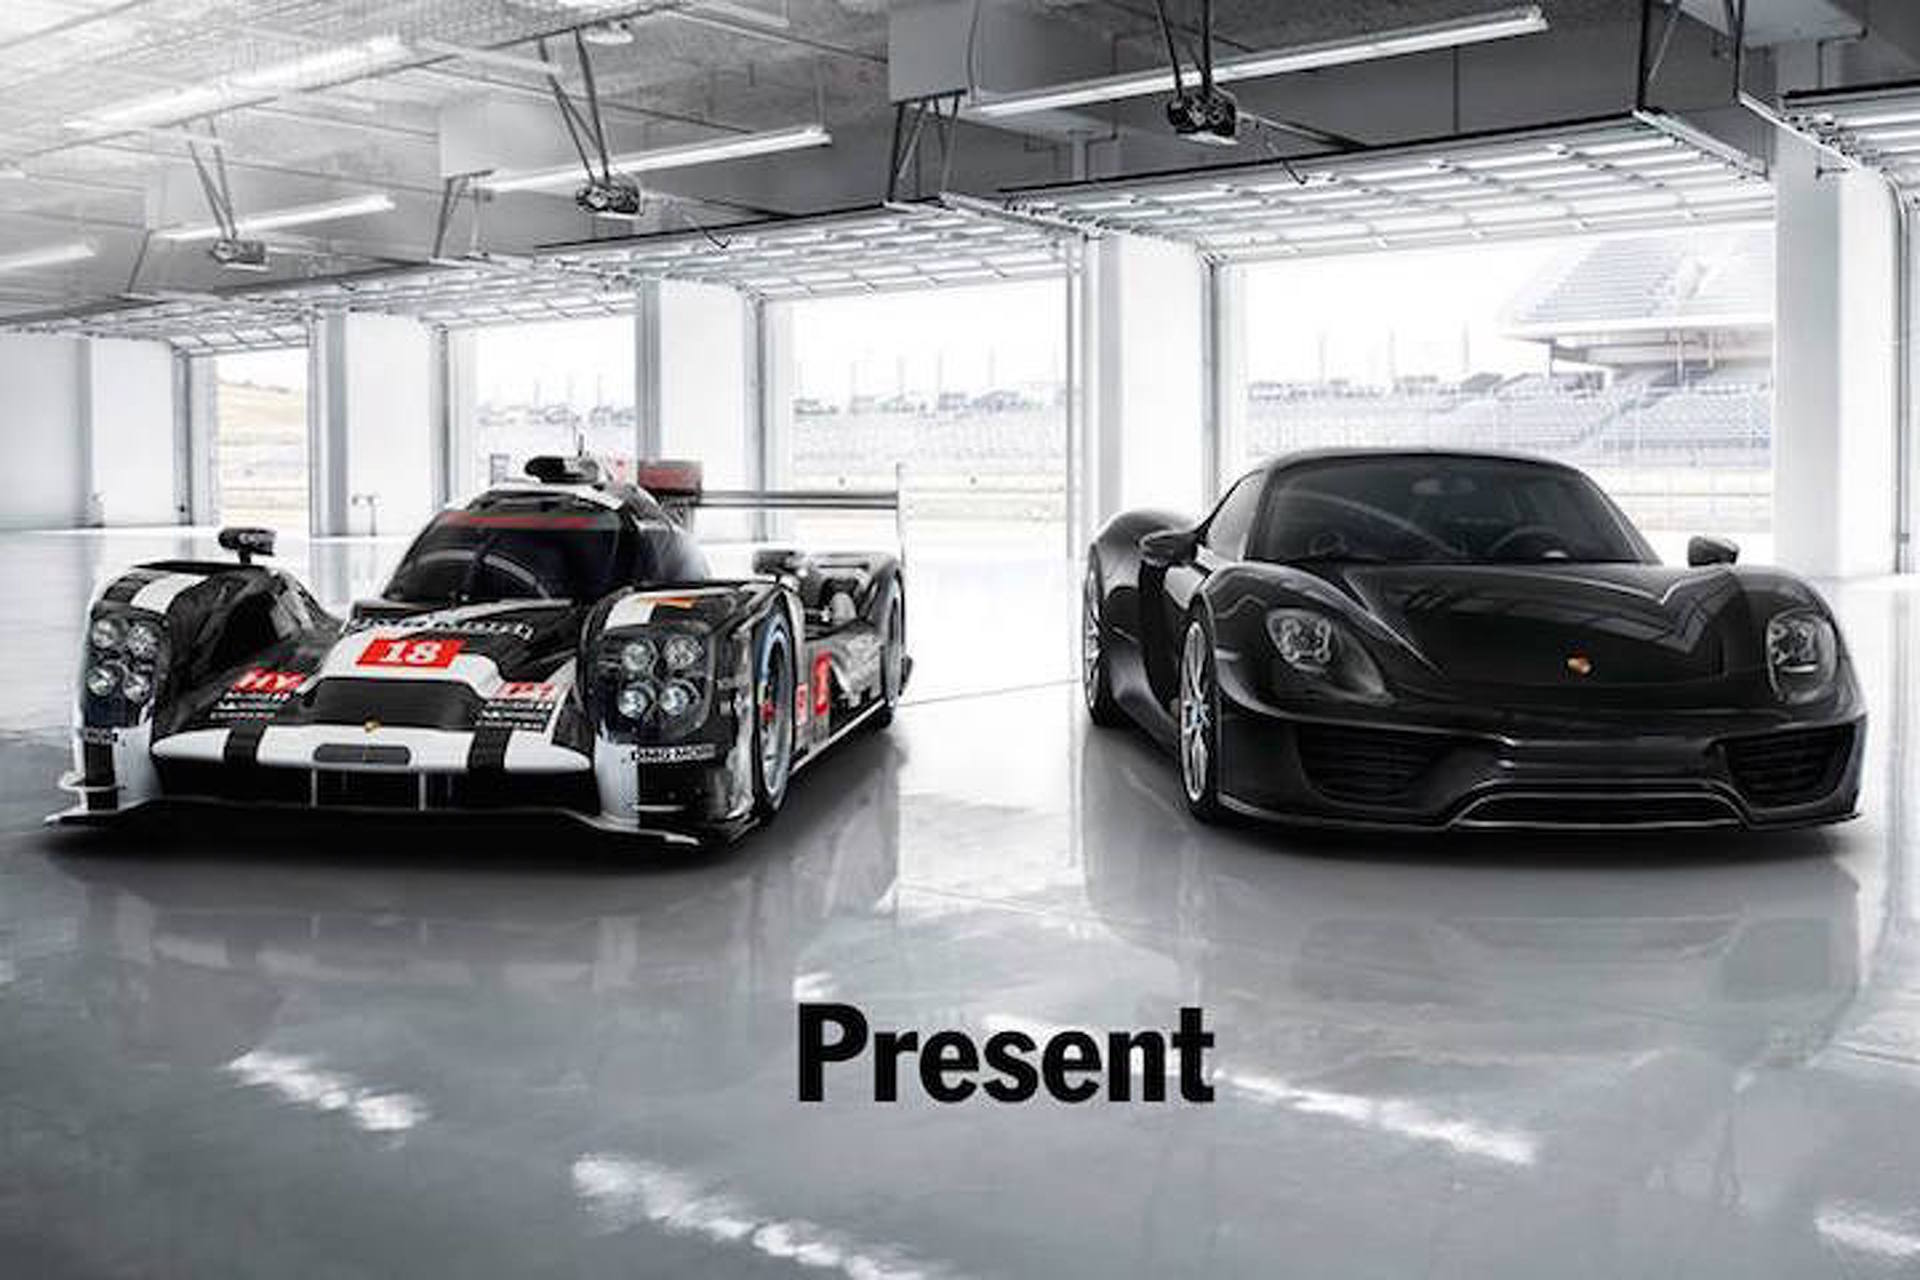 Porsche Celebrates Historic Le Mans Win by Teasing a New Sports Car